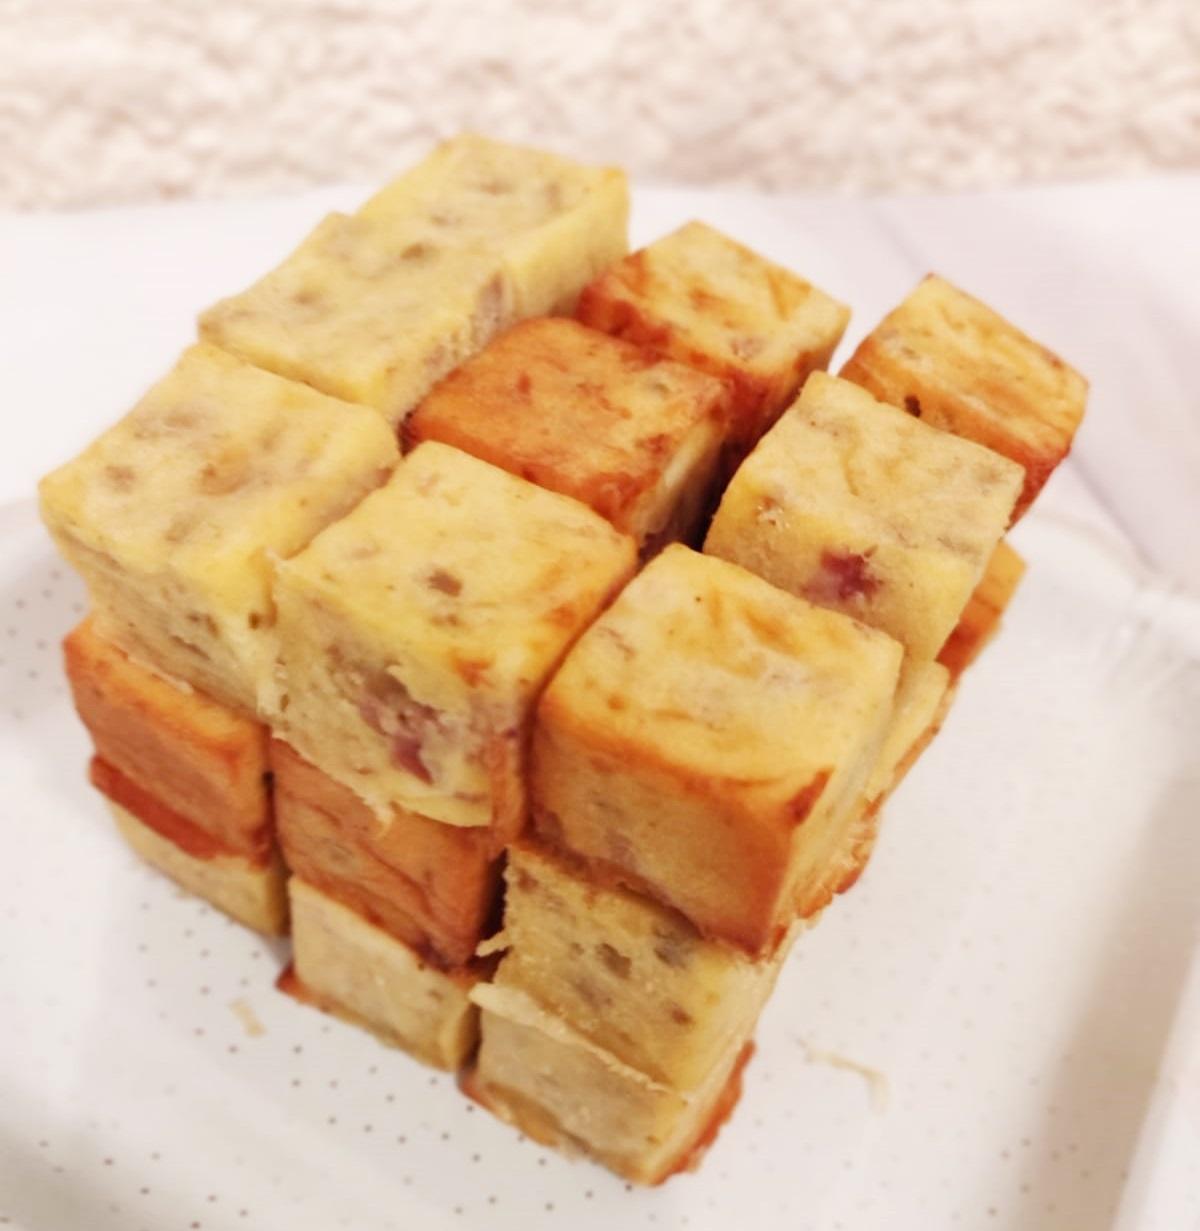 Recette cake salé olives, jambon et fromage